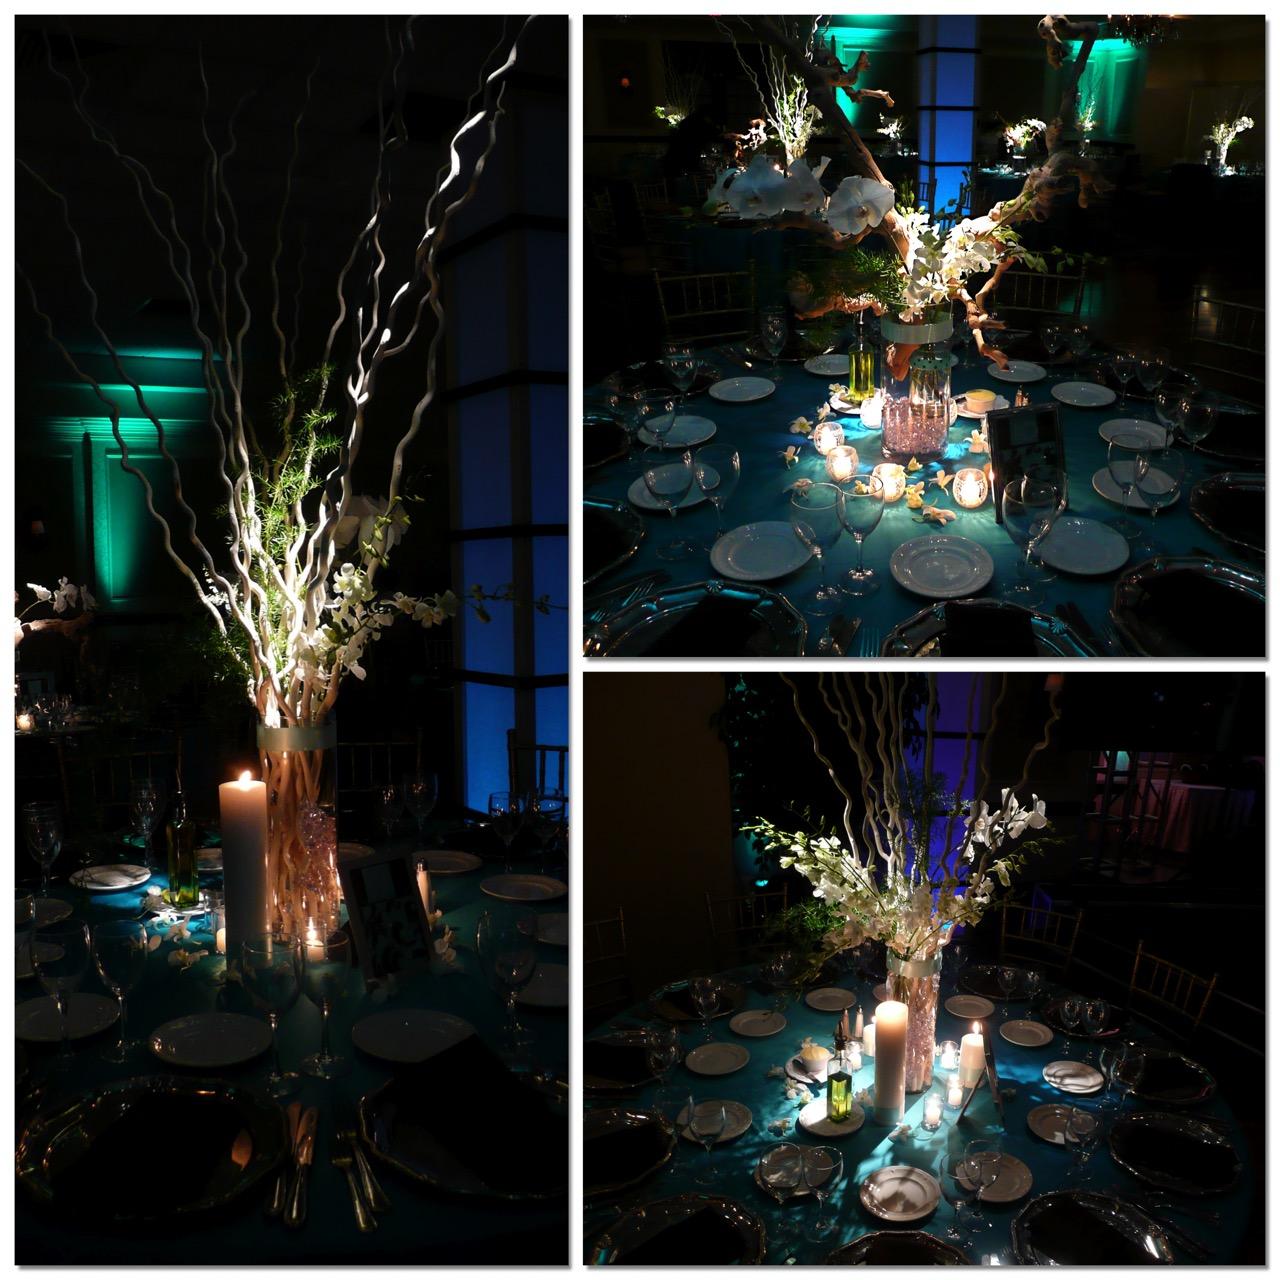 Event+Decor+Design+Lighting+NJ+NYC+Eggsotic+Events+NJs+Best+Event+Decorator+Event+Lighting+Event+Design+Wedding+Bar+Mitzvah+Bat+Mitzvah+Gala+Fundraiser+Social+Corporate+09.jpg